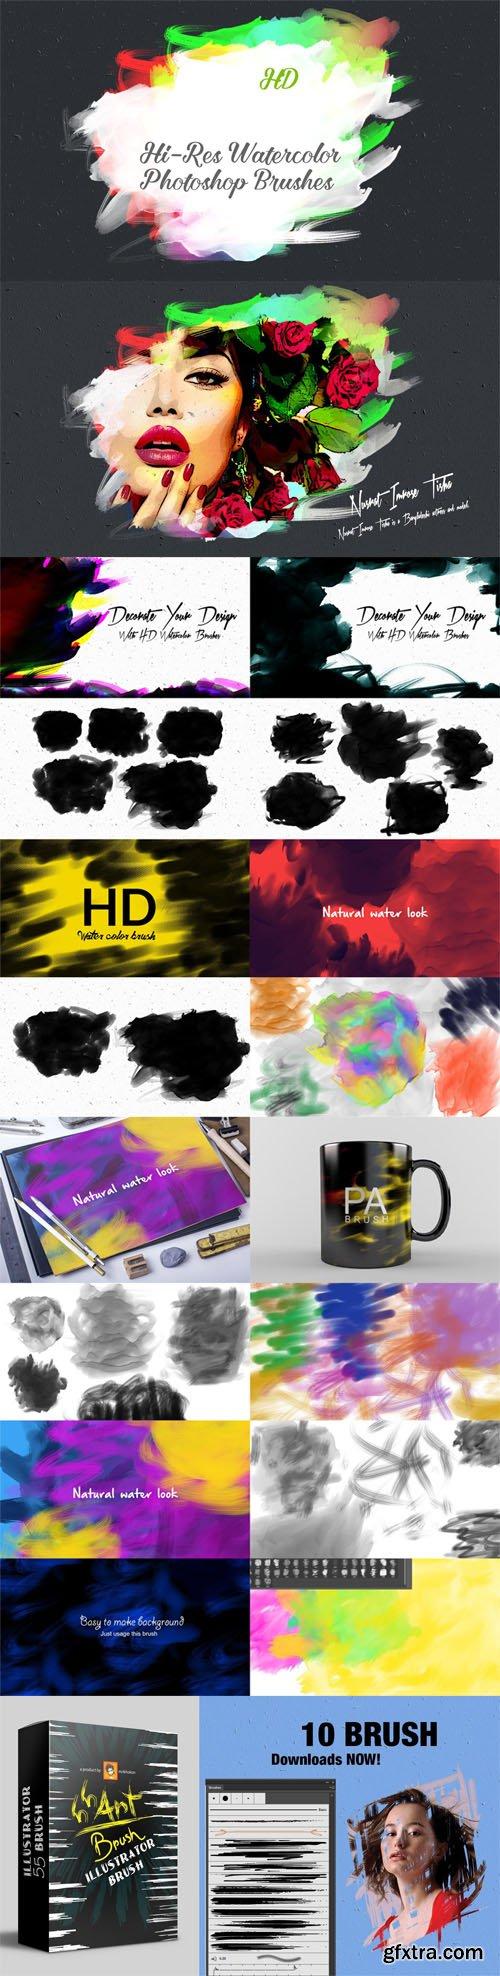 35+ HD Watercolor Photoshop Brushes [ABR] + Illustrator Art Brush [Ai]